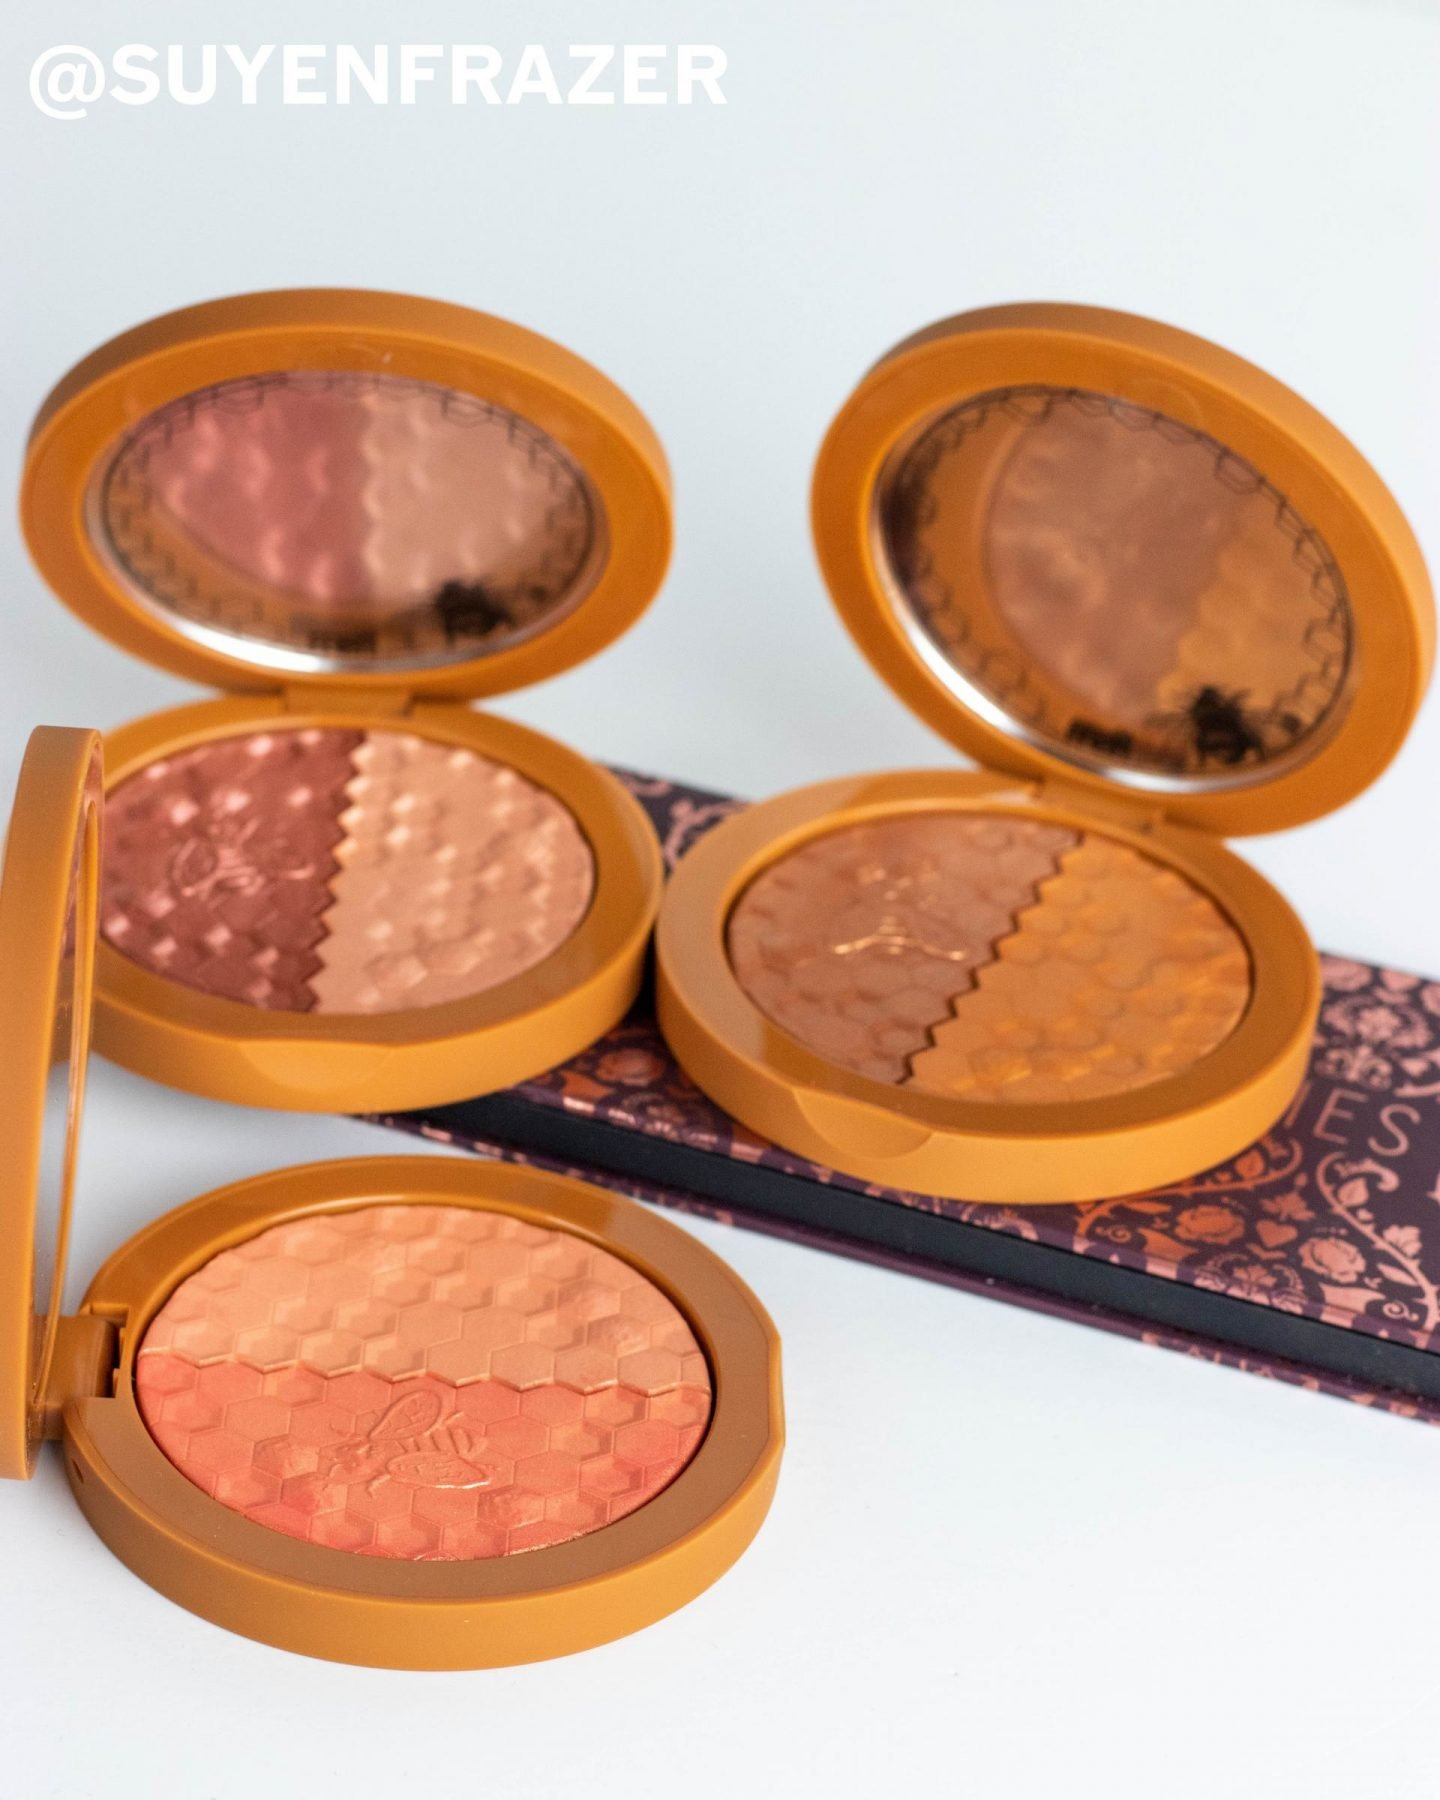 Melt Cosmetics digital dust duo blush